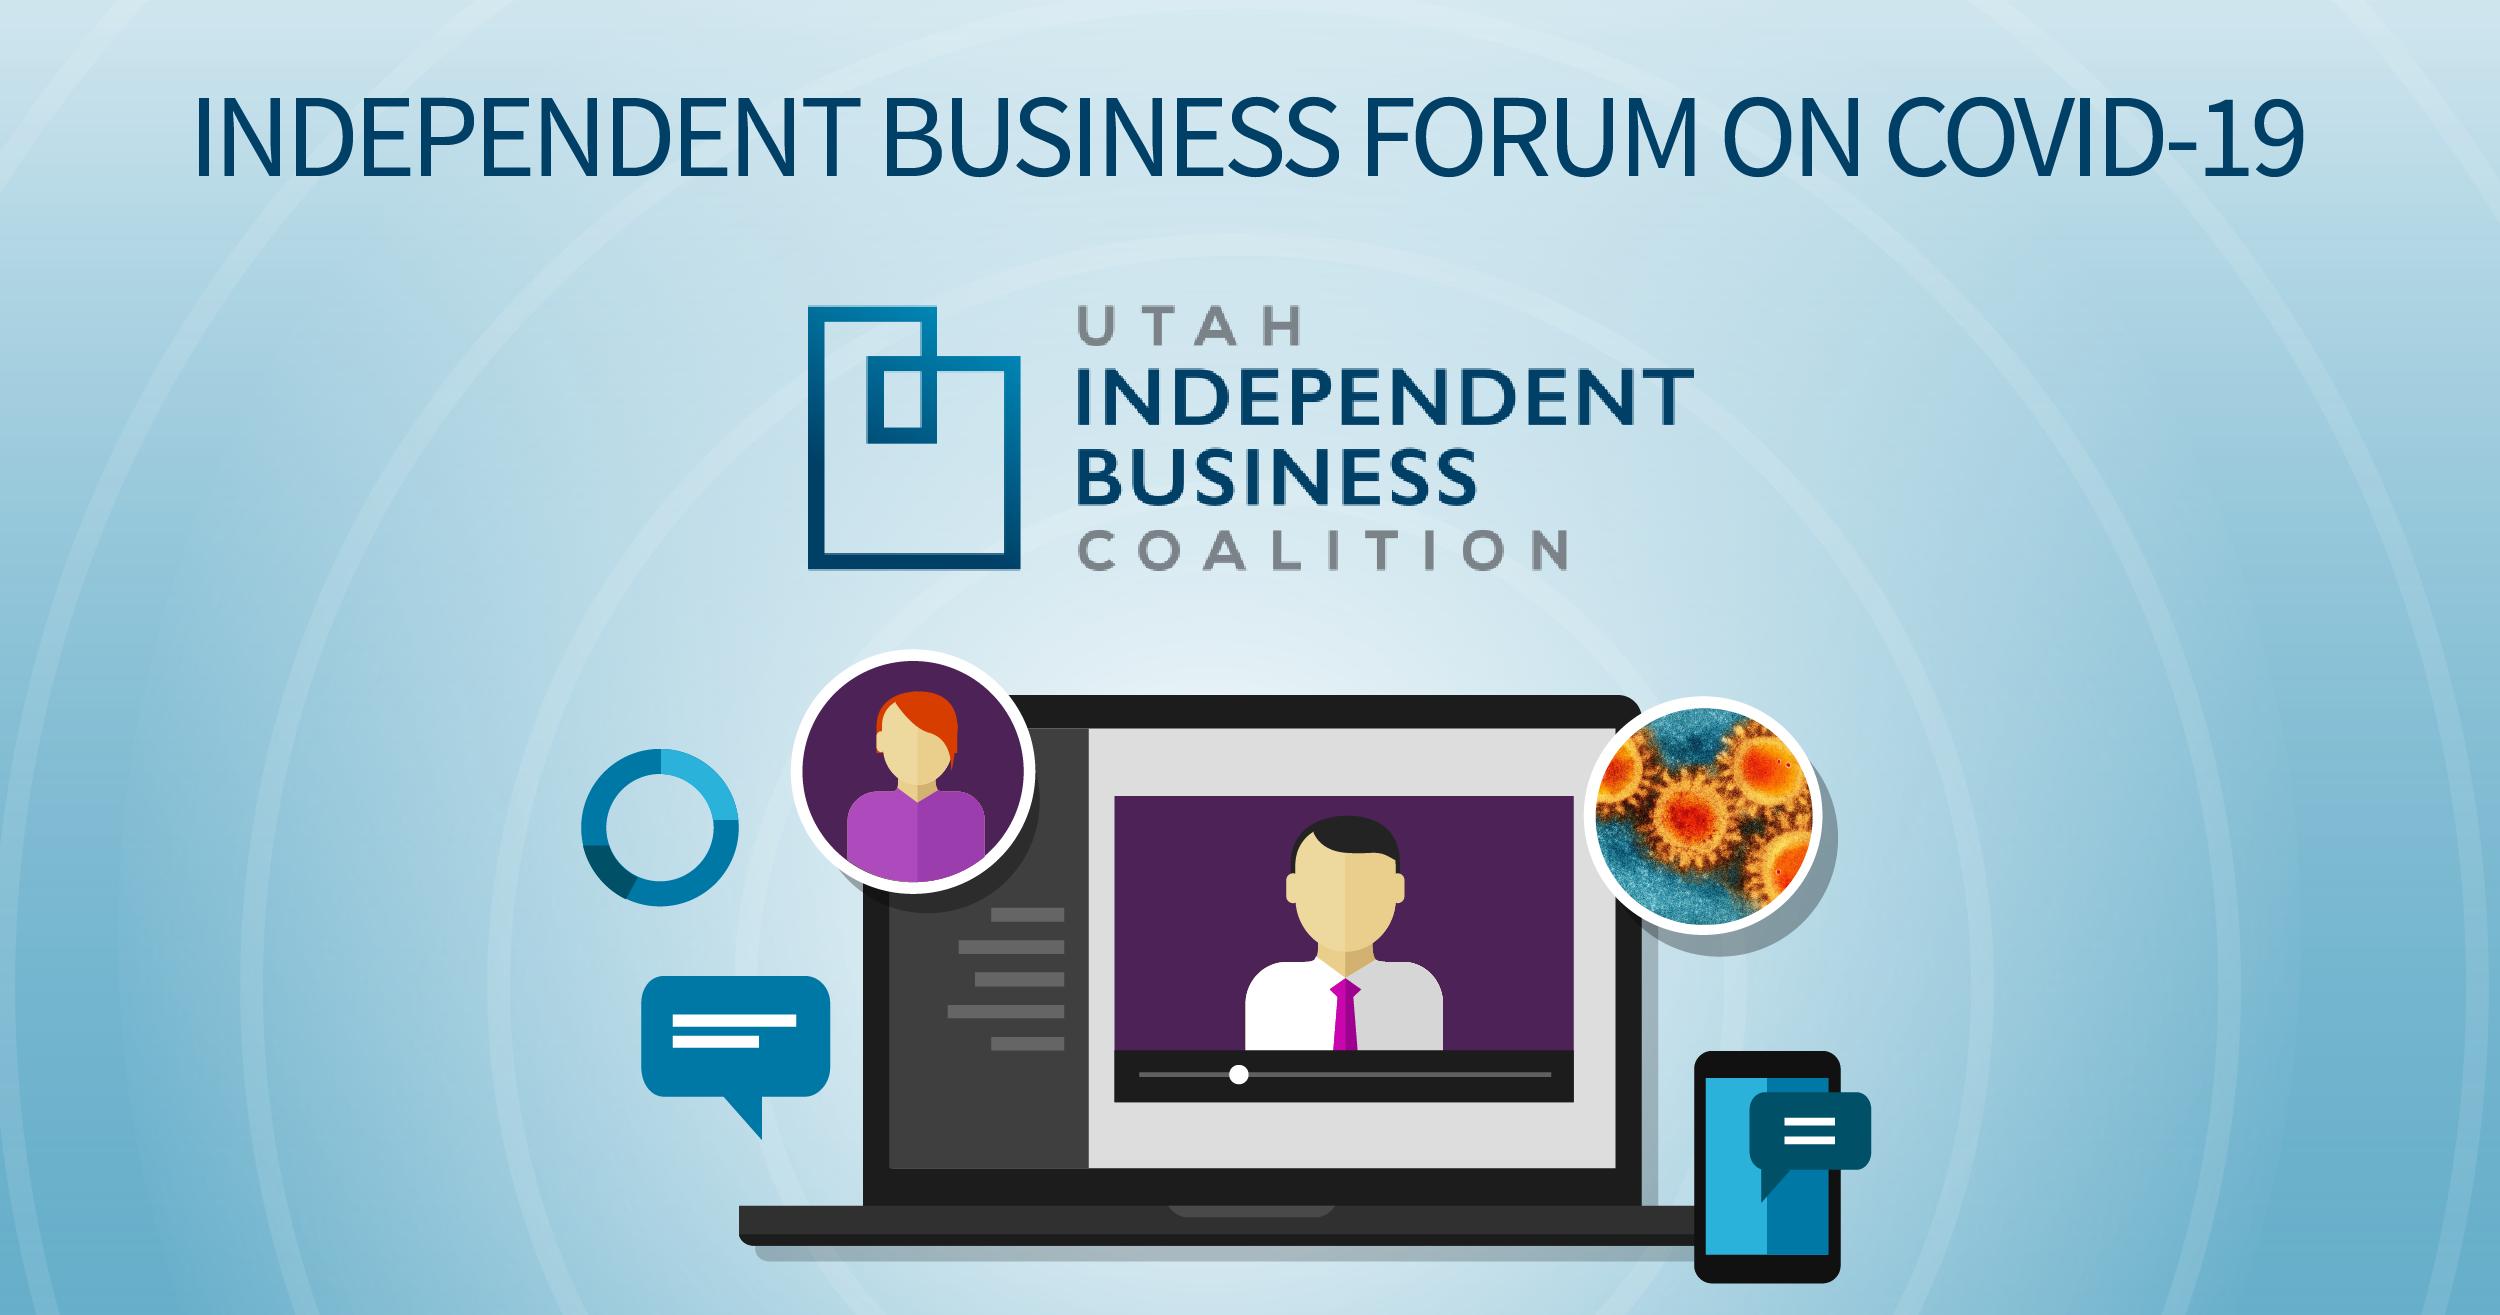 UIBC-COVID-19 Forum